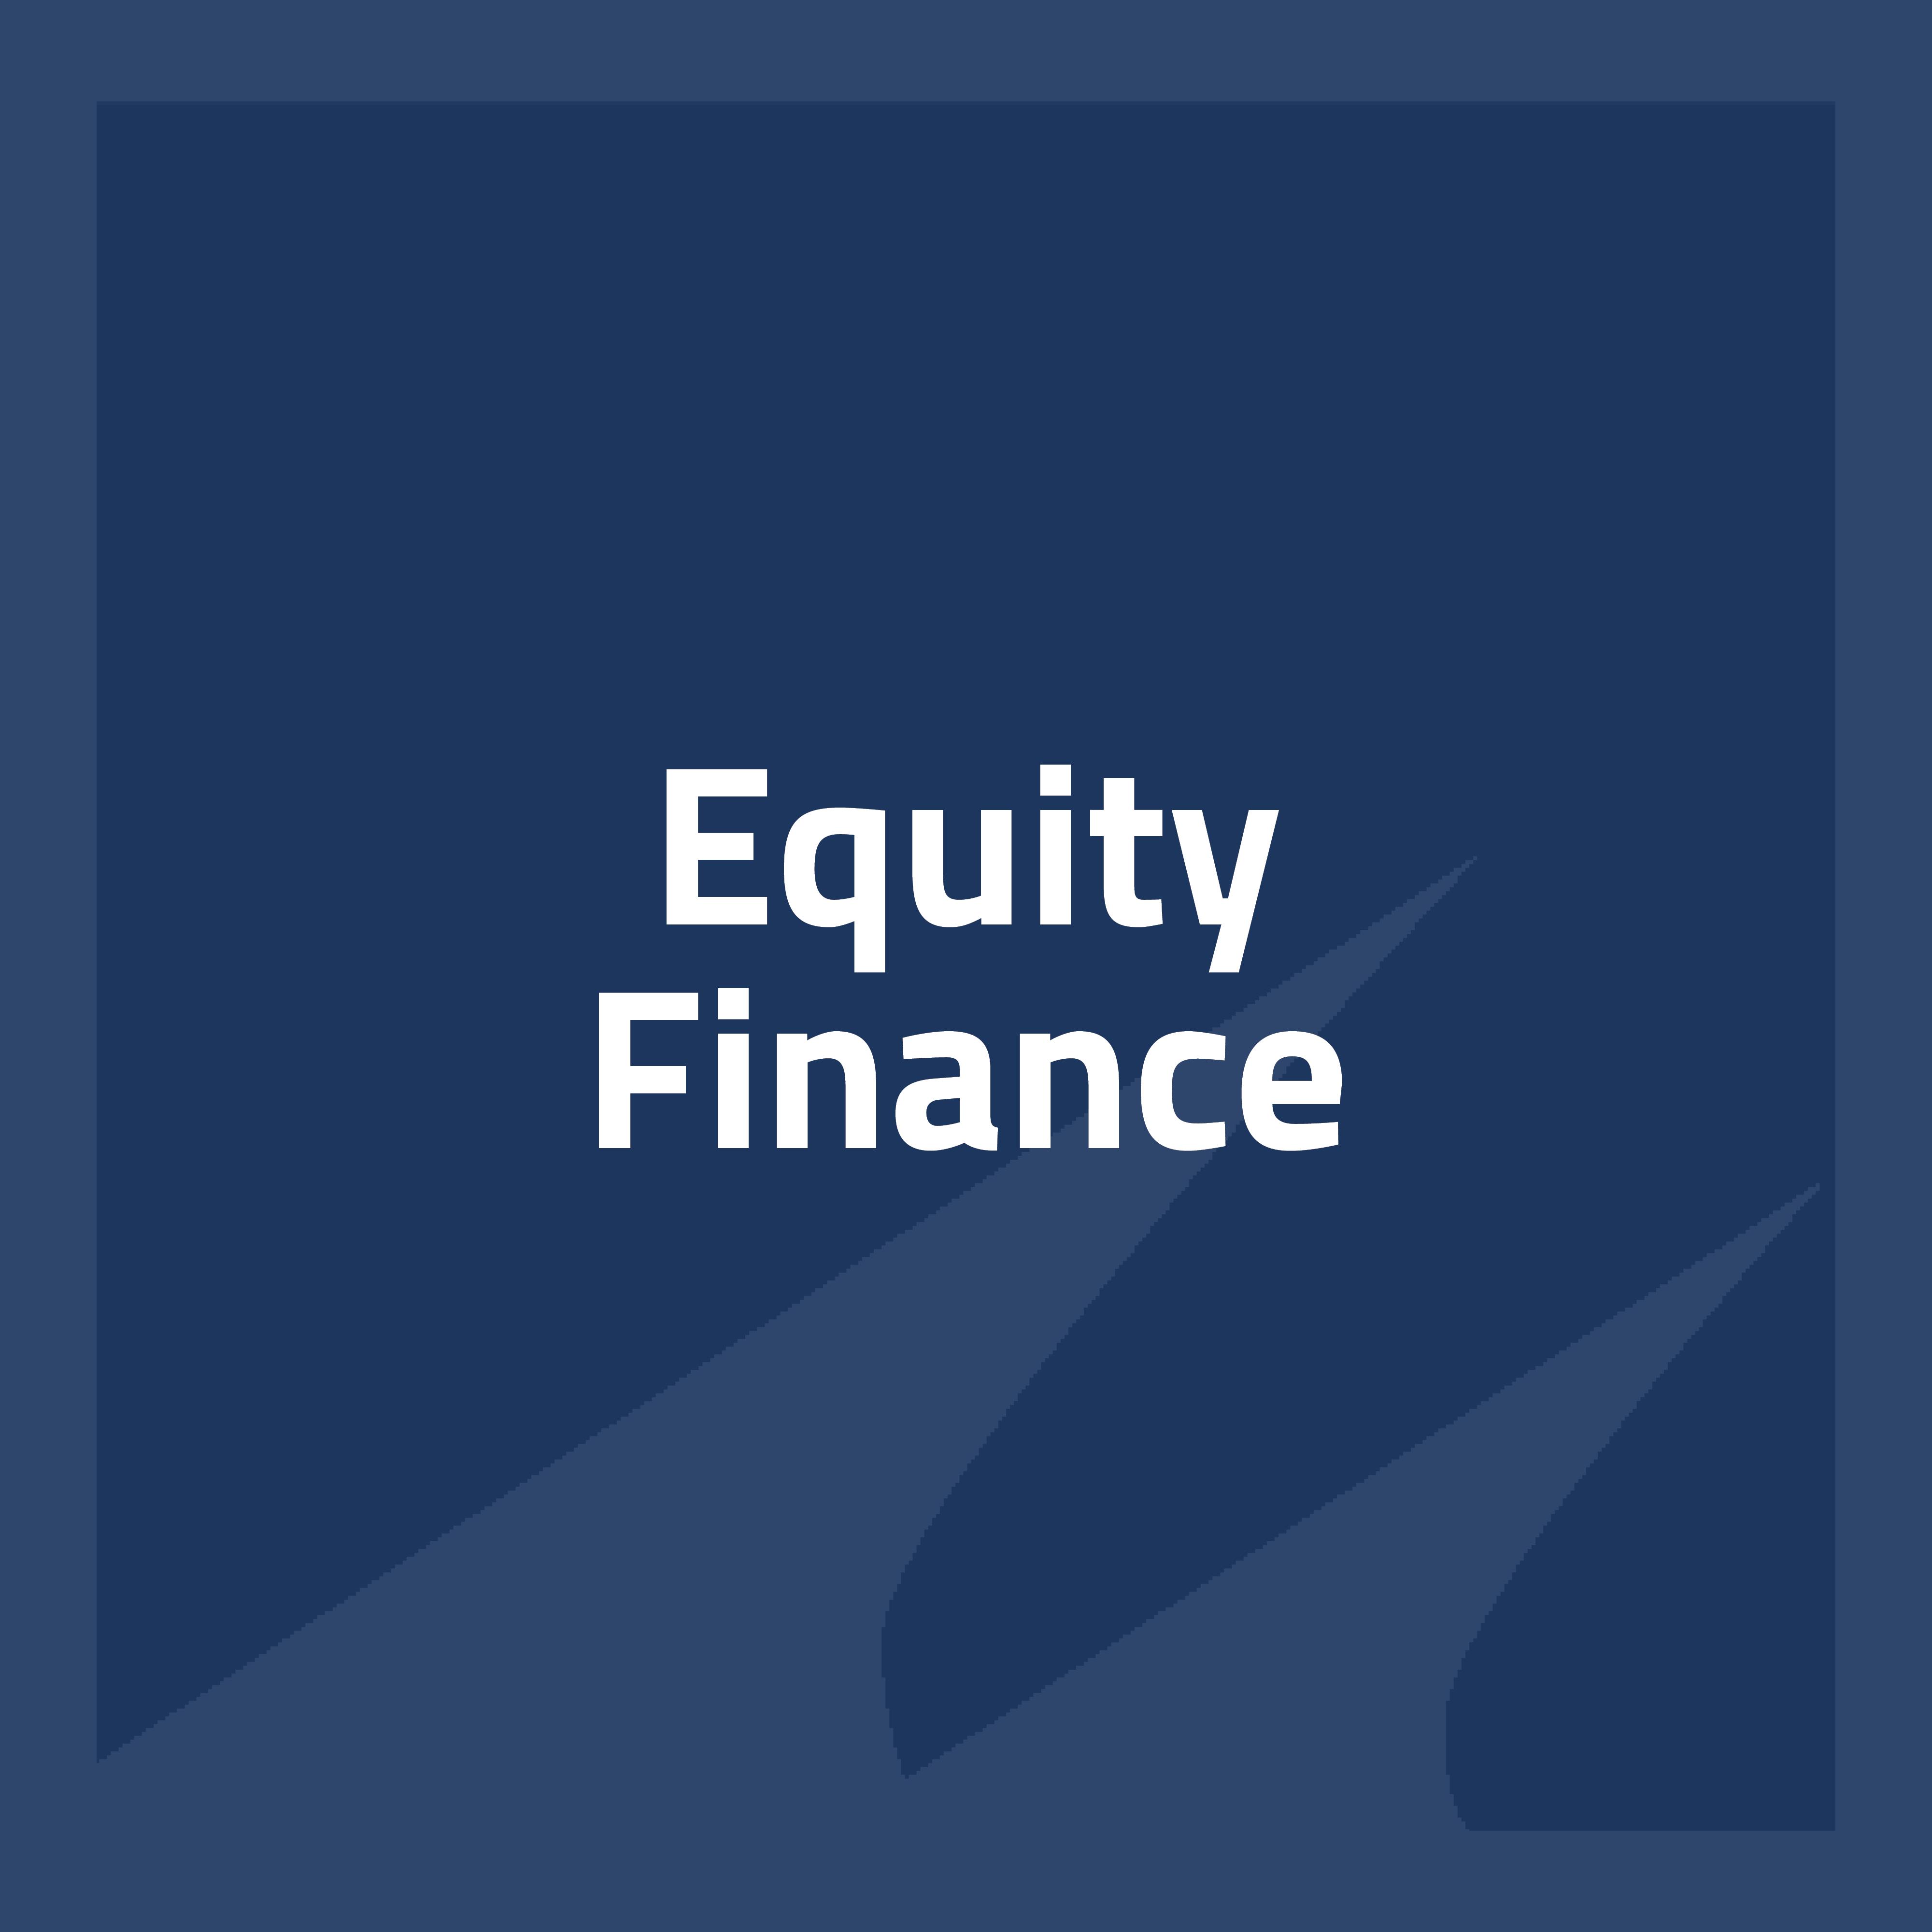 EquityFinance-1